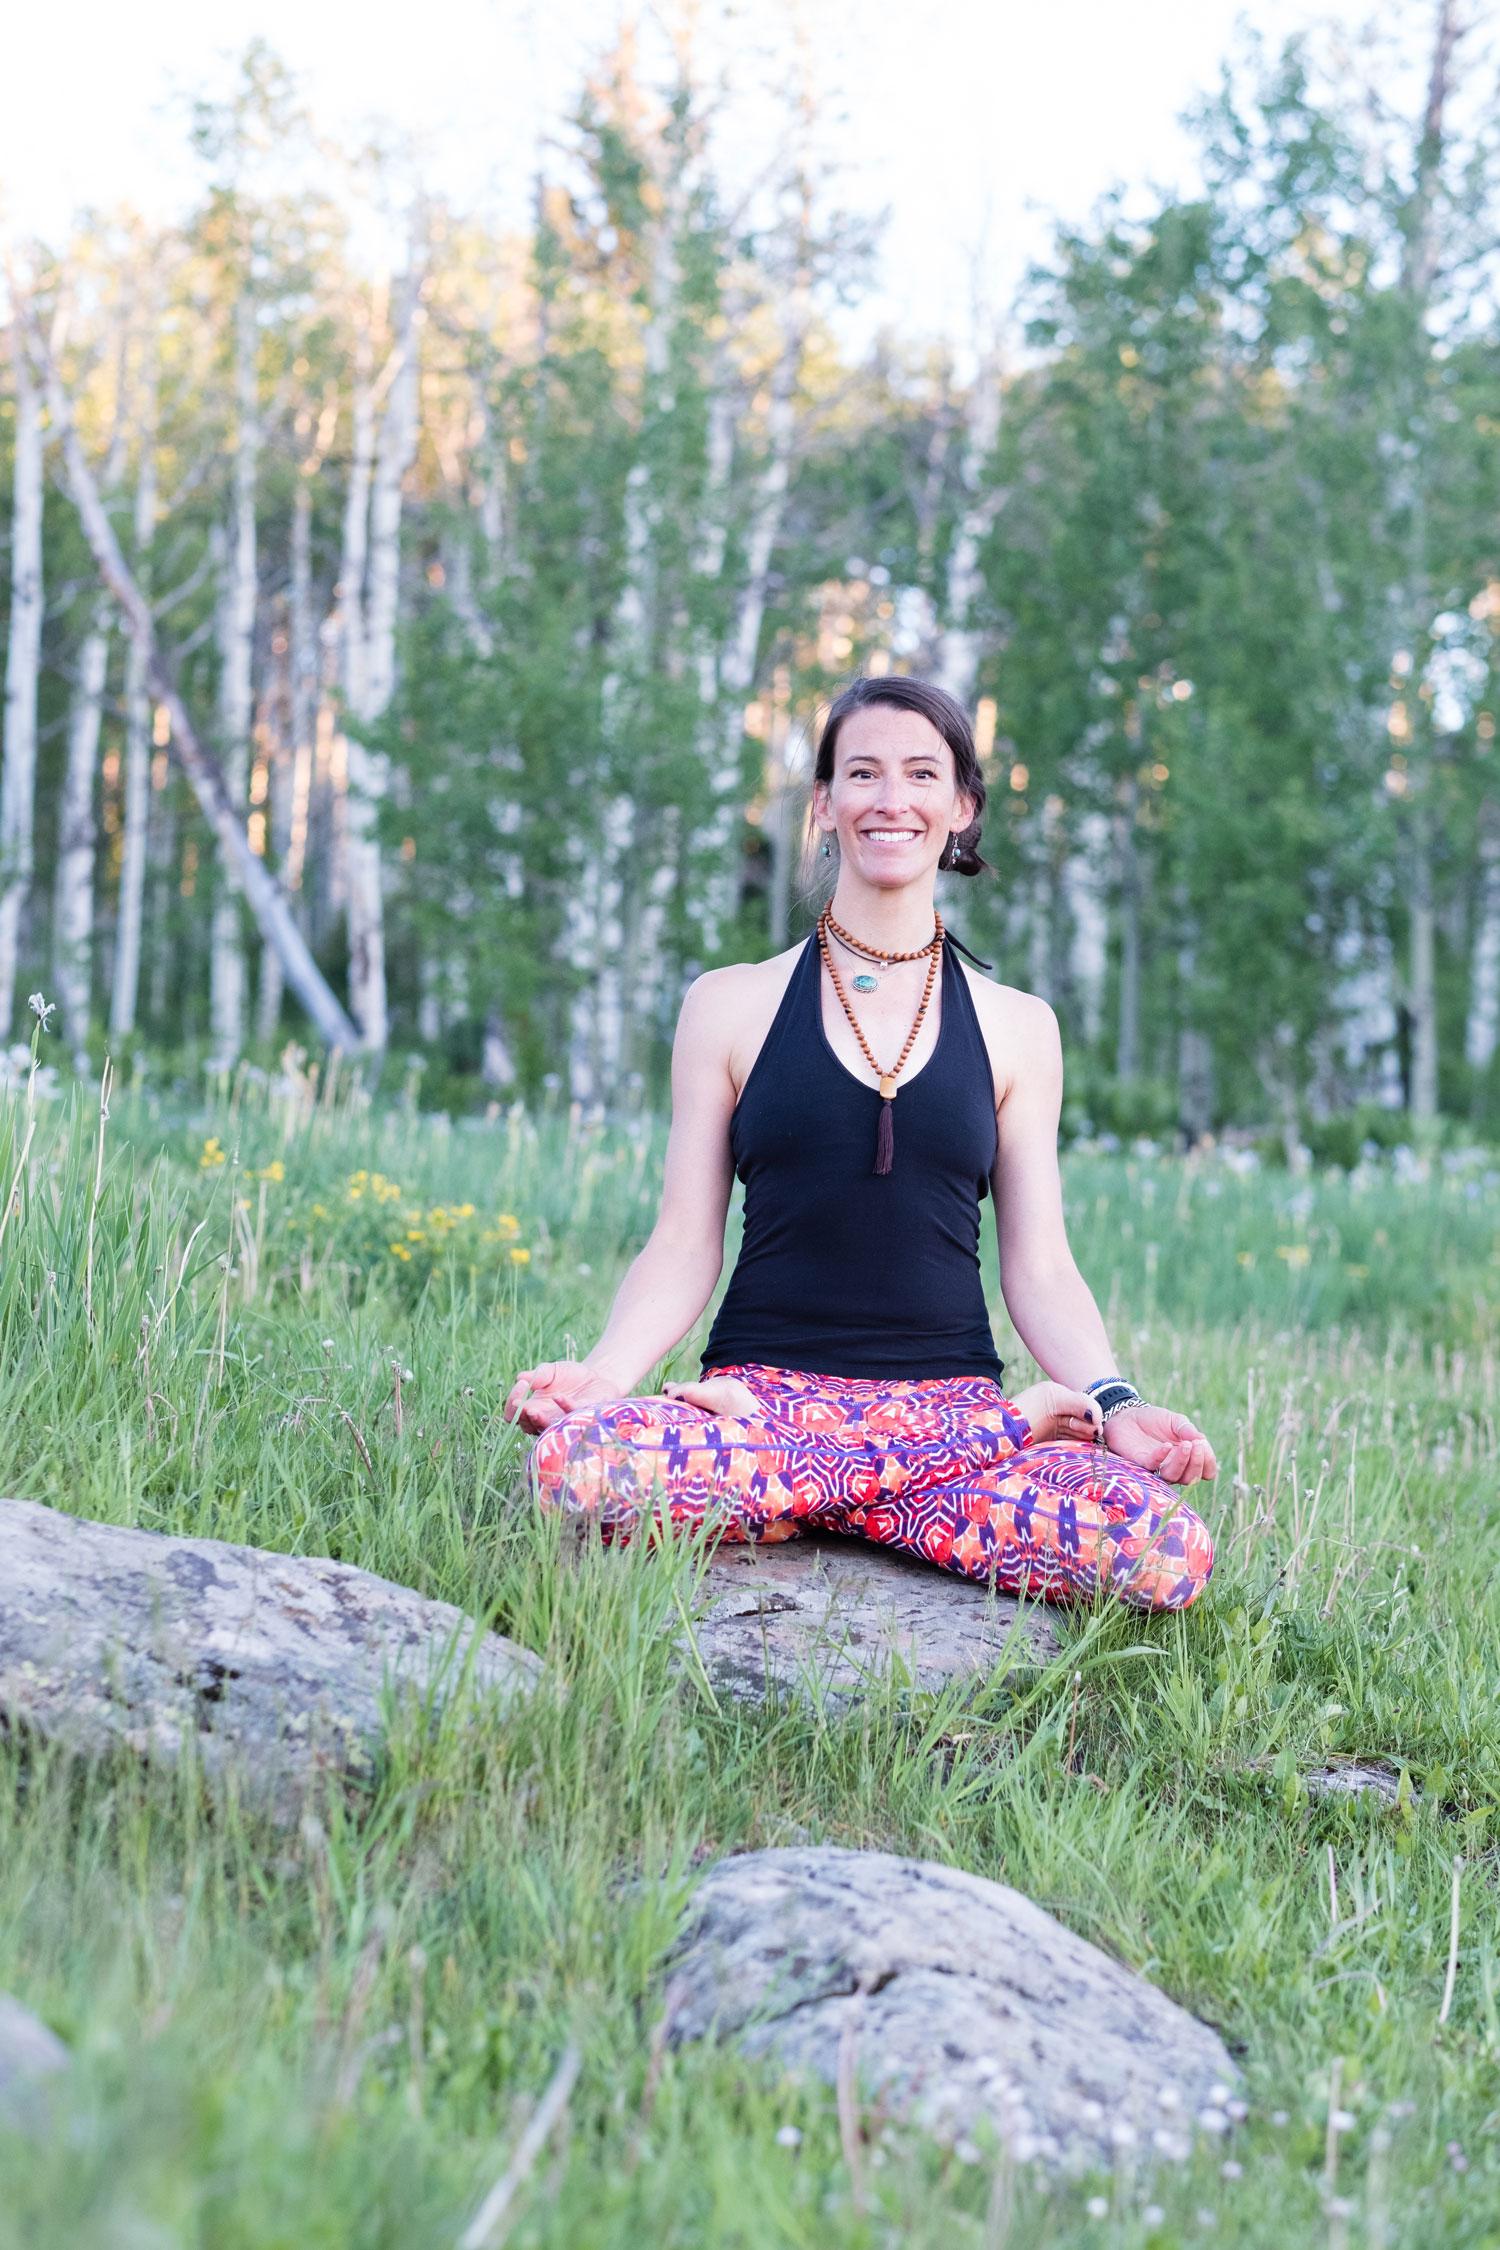 Yoga with K2: About Kristina, Hatha Flow, Vinyassa Flow, Yin Yoga Classes in Basalt Colorado